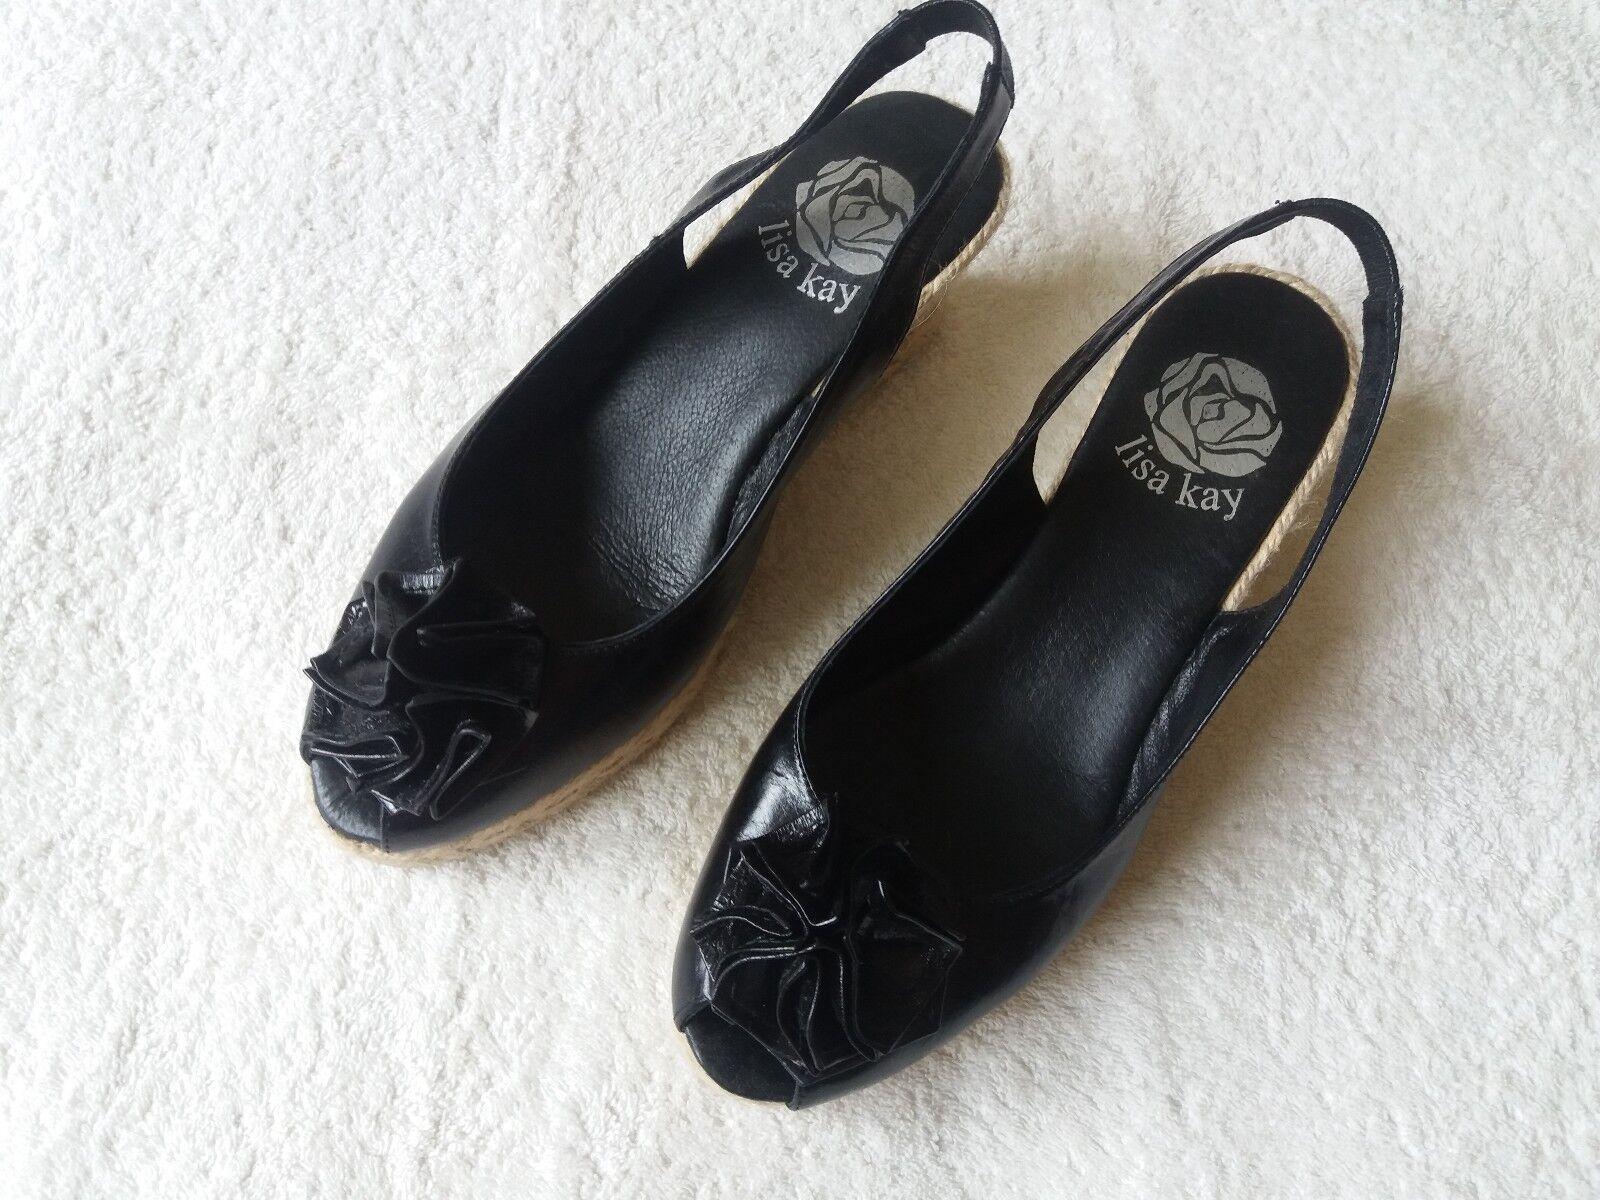 Women's Lisa Kay Sandals EU Size 40  Good Condition